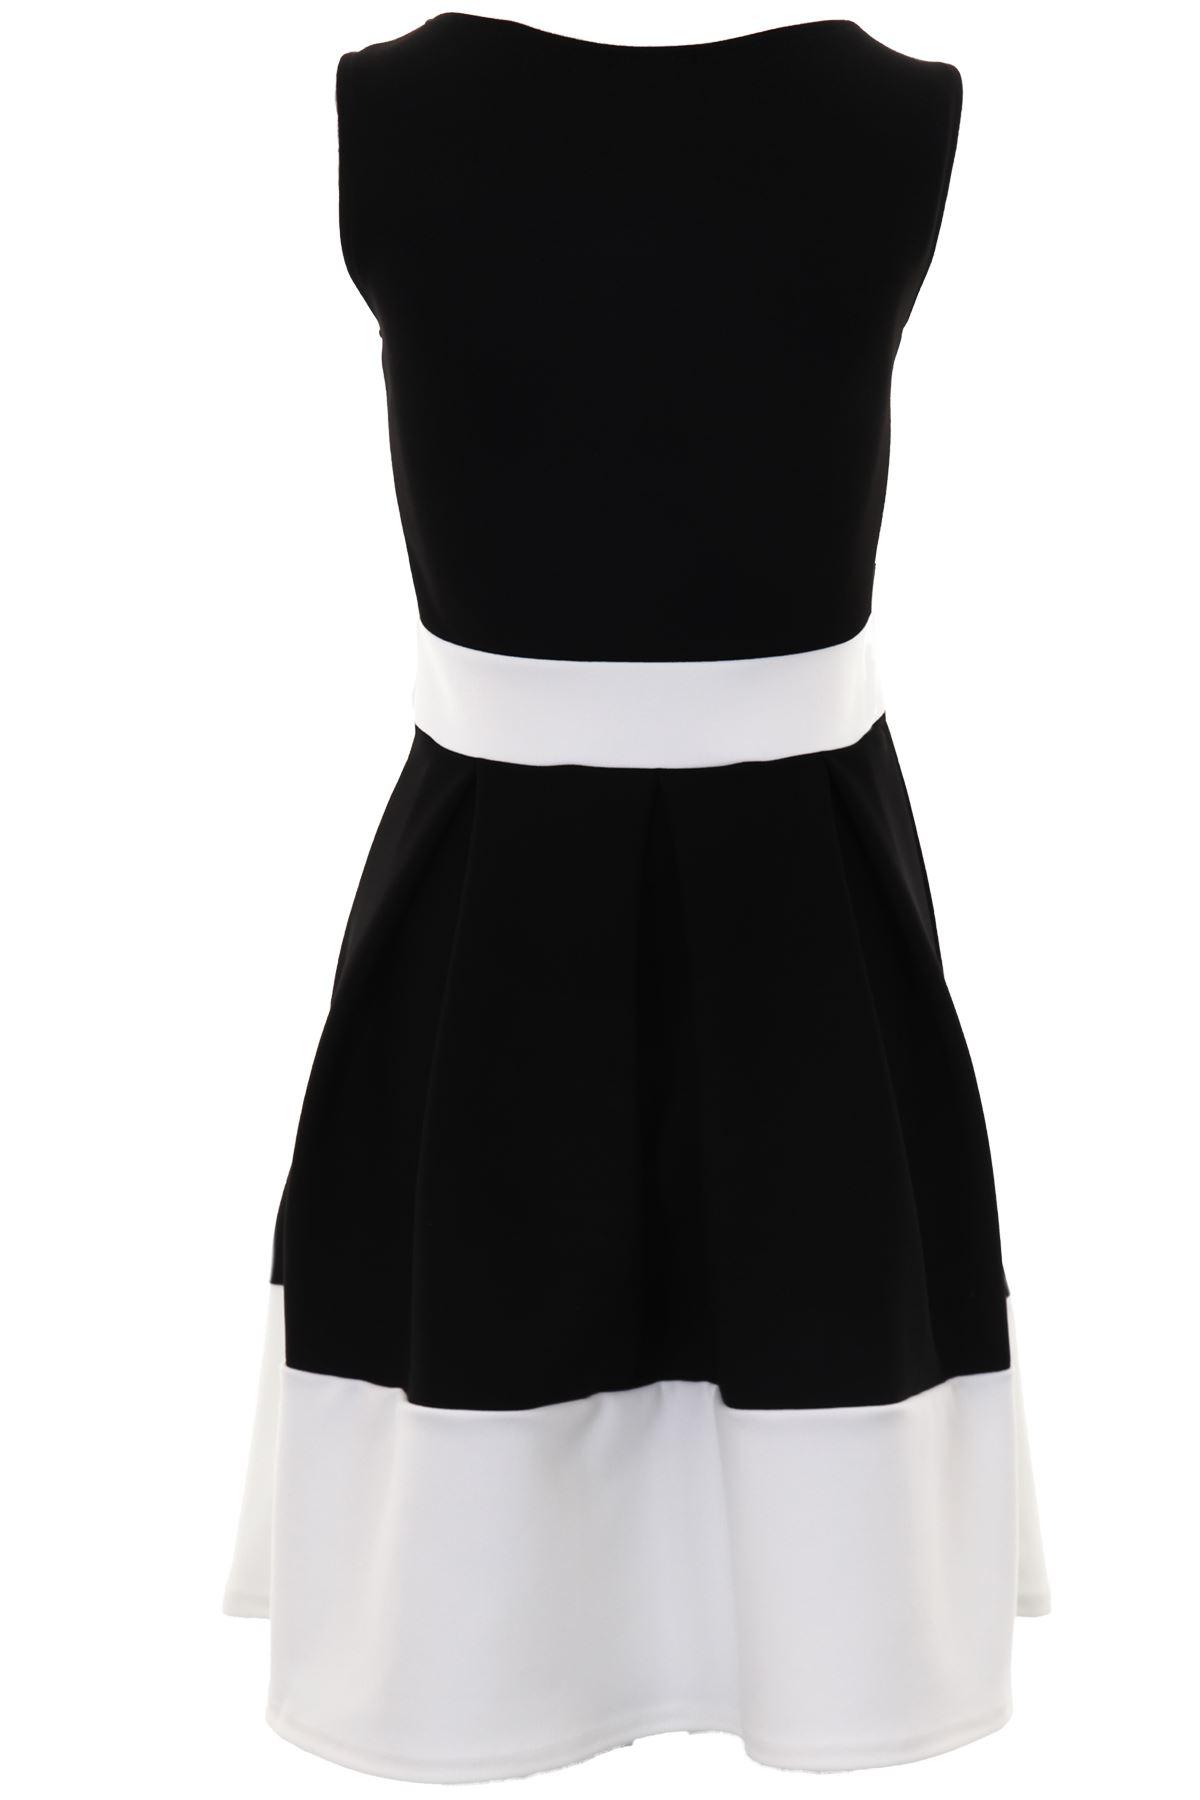 Ladies Sleeveless Bow Waist Panel Contrast Block Hem Pleated Skater Dress